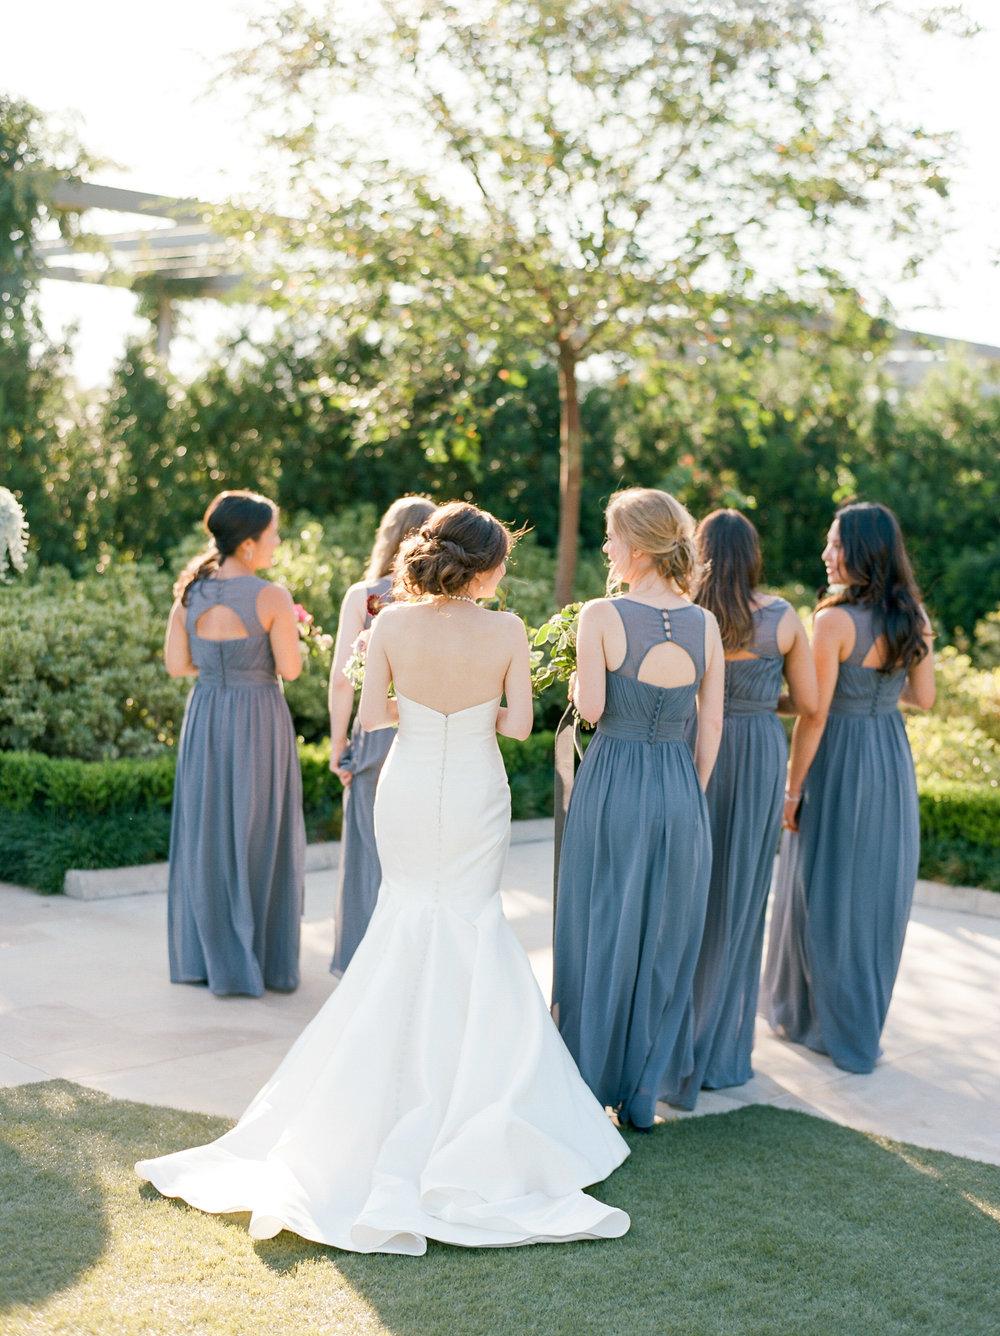 The-Knot-Texas-Magazine-Wedding-Top-Best-Houston-Wedding-Photographer-Fine-Art-Film-Dana-Fernandez-Photography-114.jpg